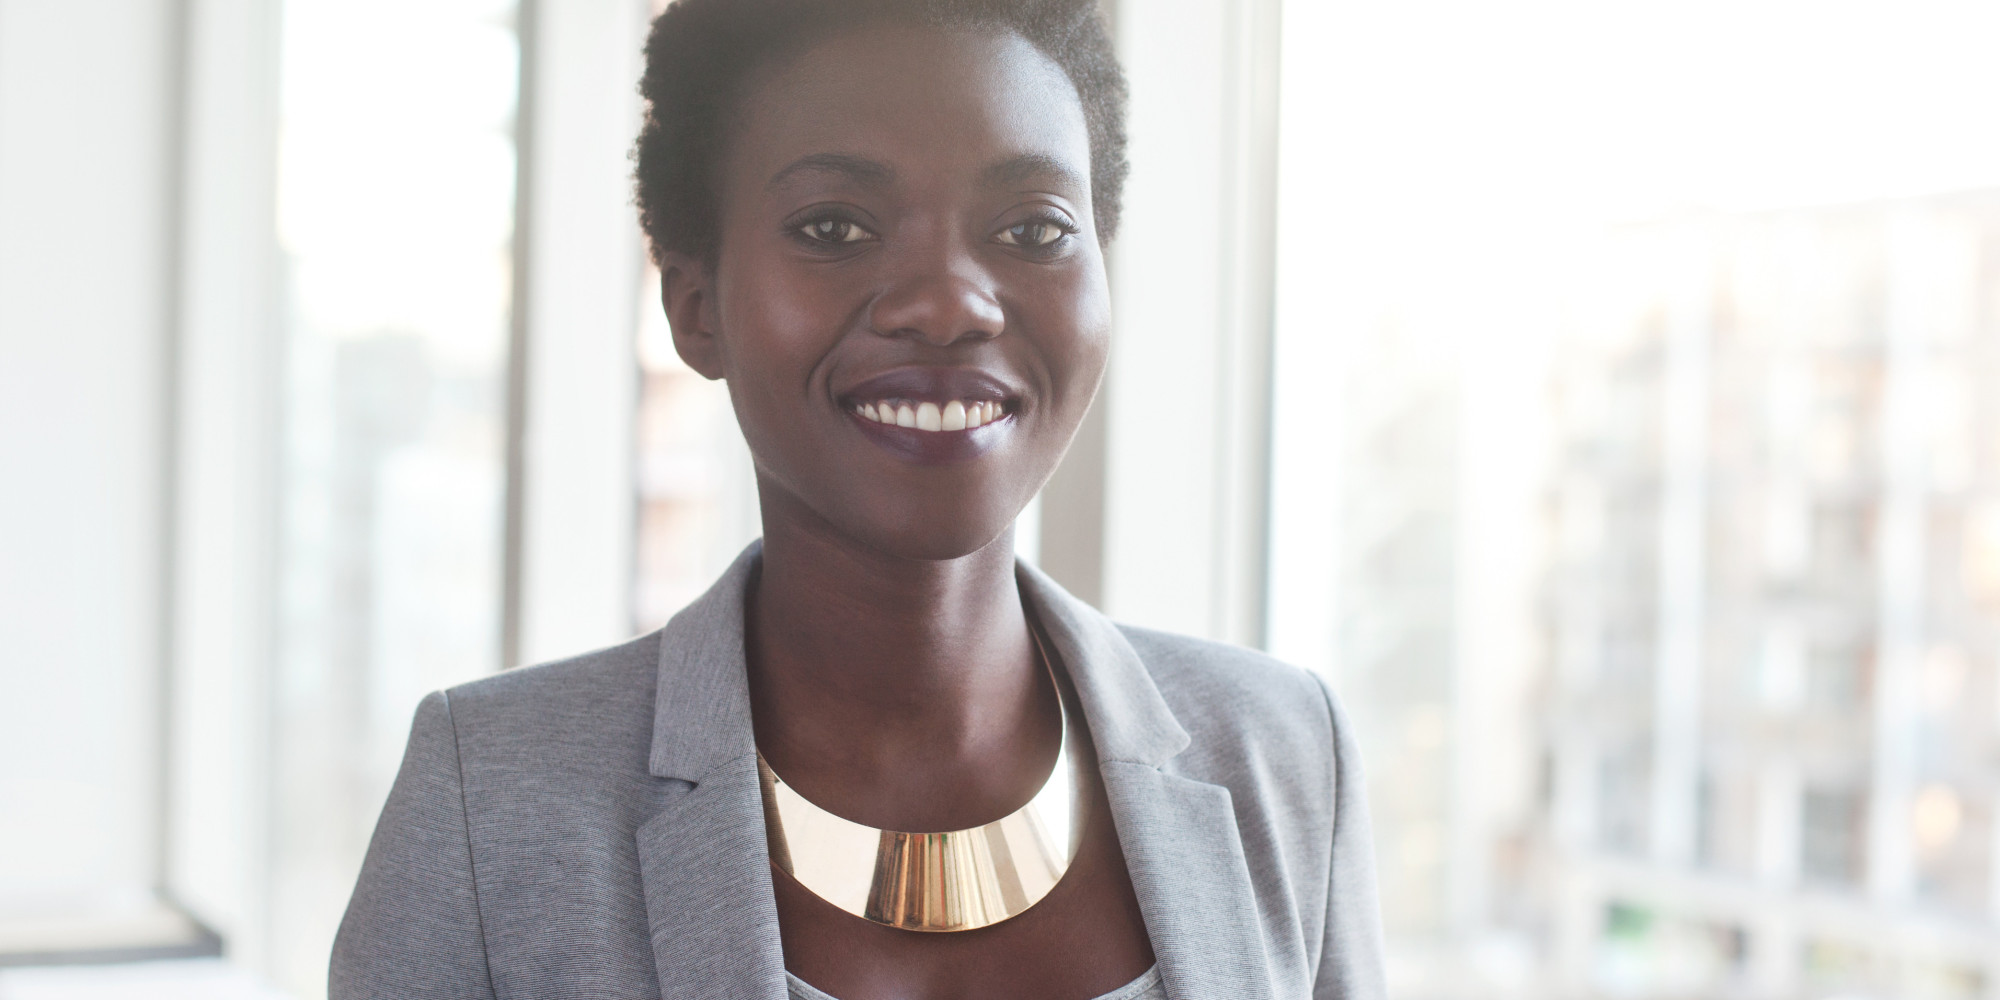 Black woman professional